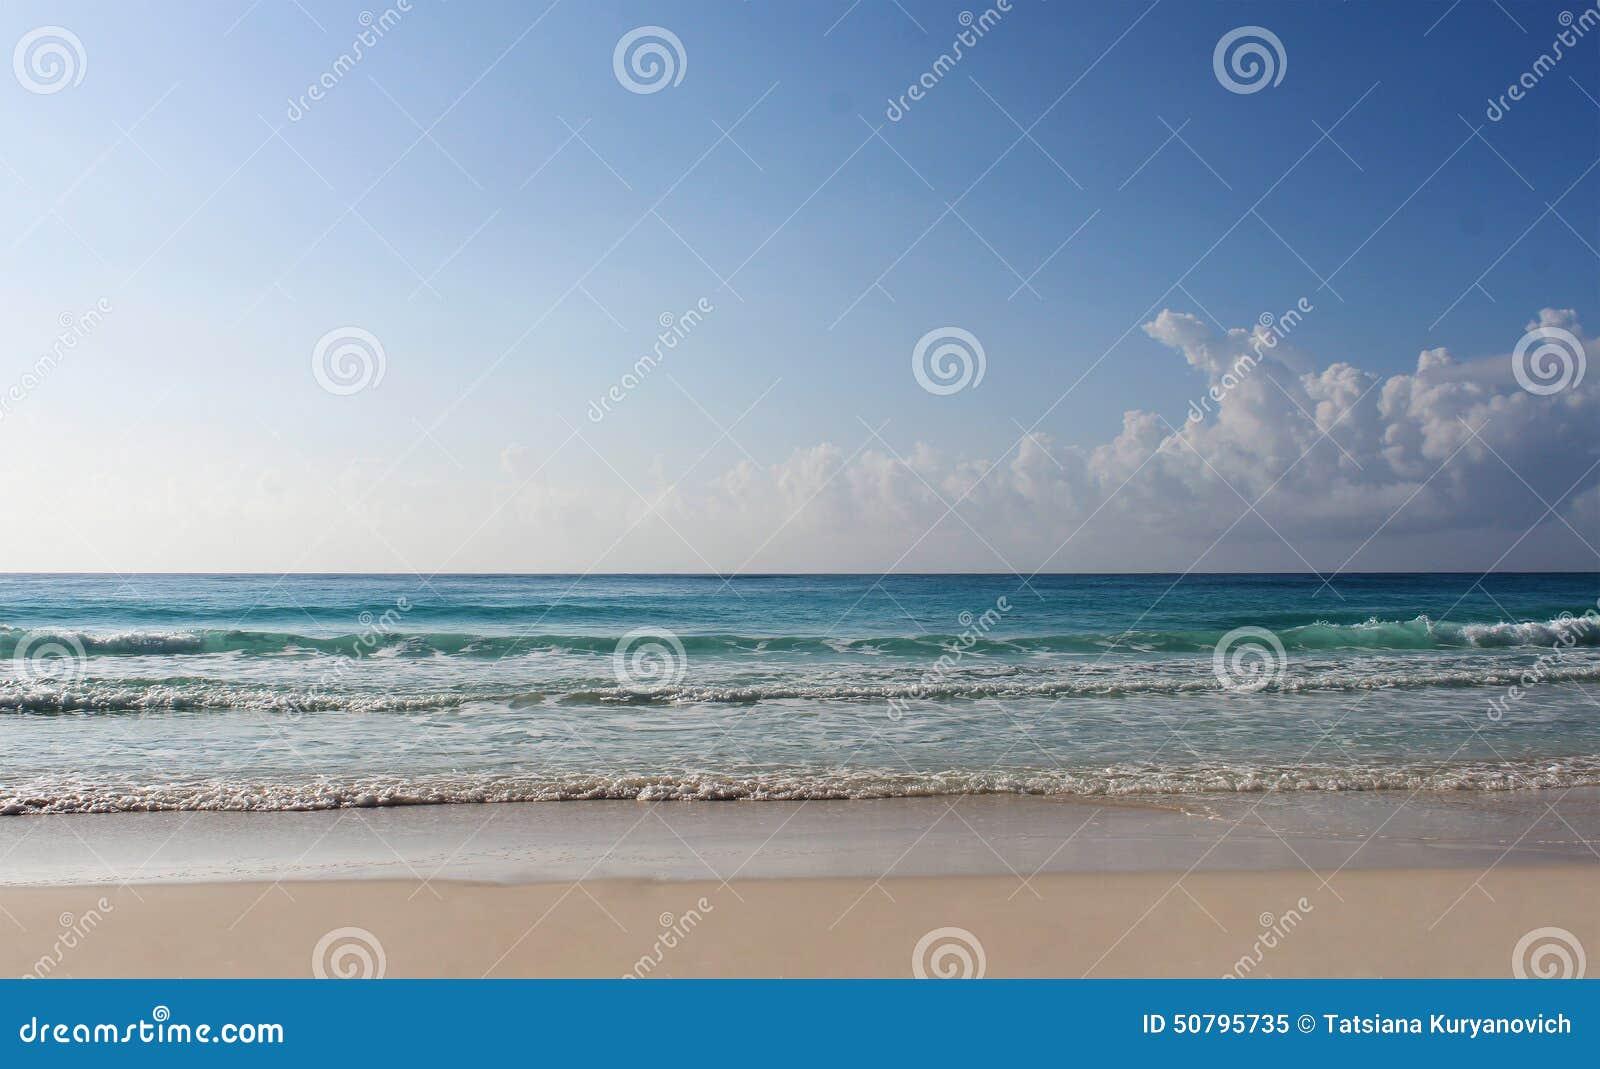 Beach and Caribbean sea, illustration